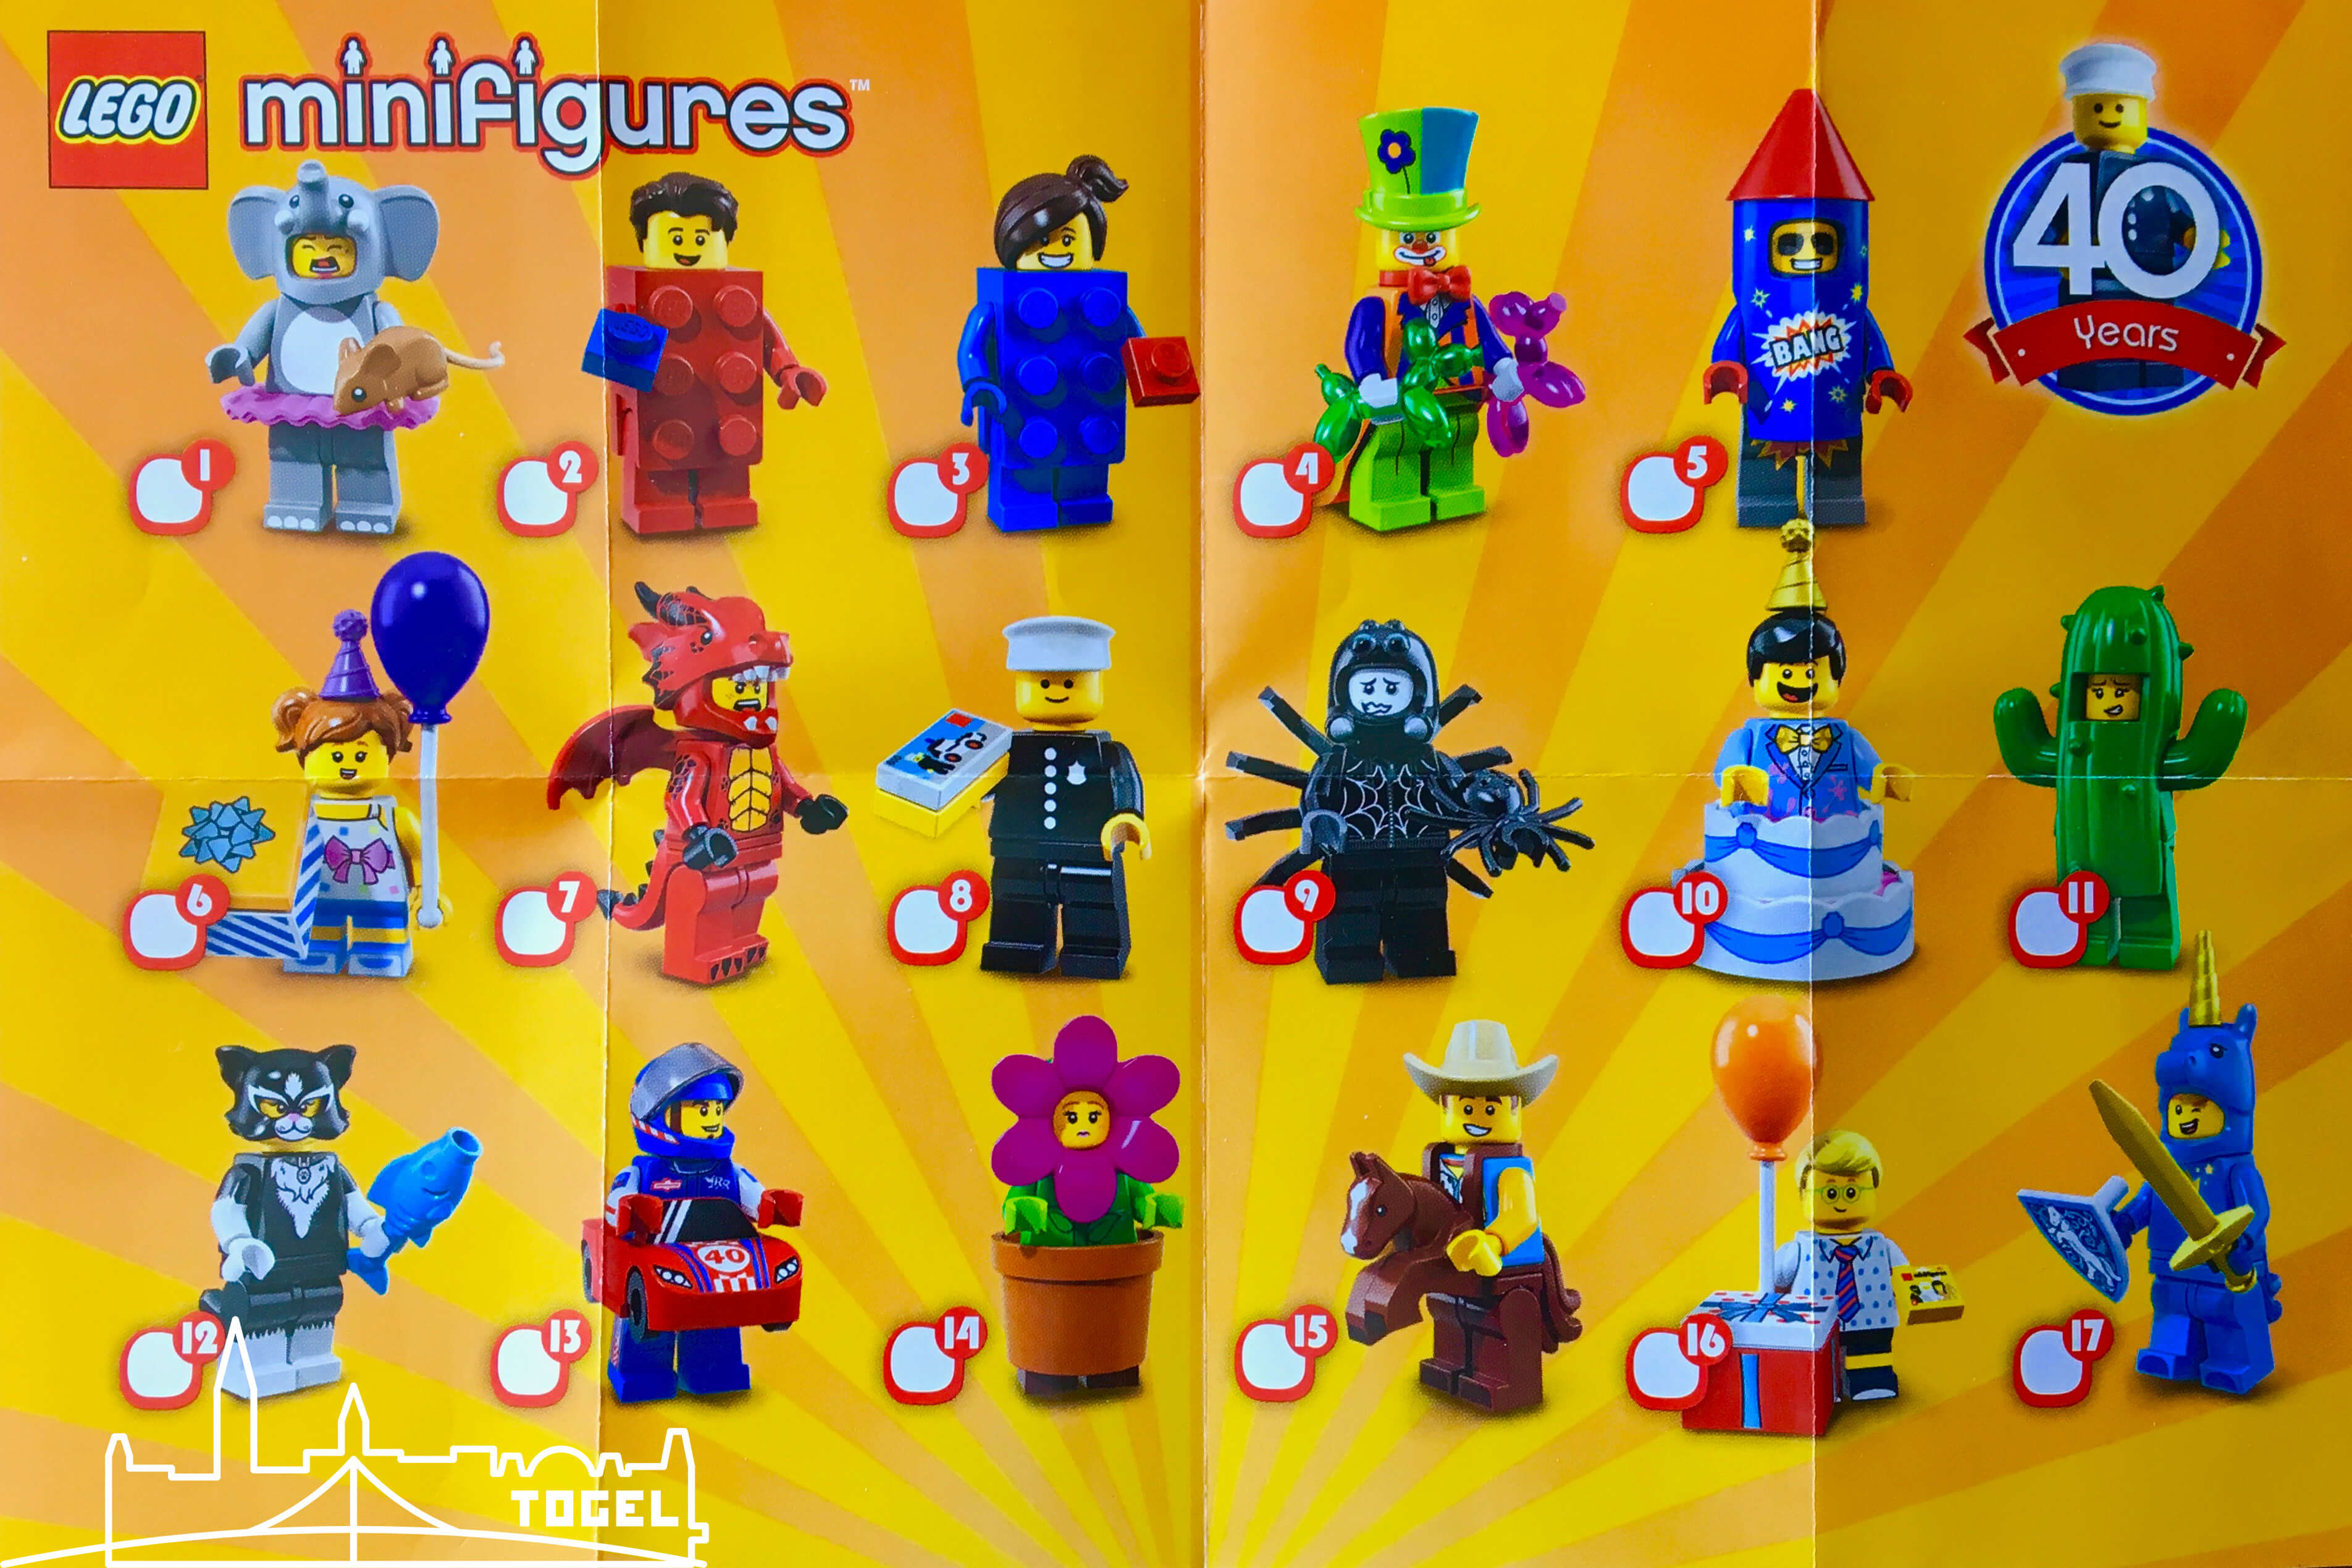 Lego Minifigur Serie 18 Beipackzettel - 40 Jahre Minifiguren.